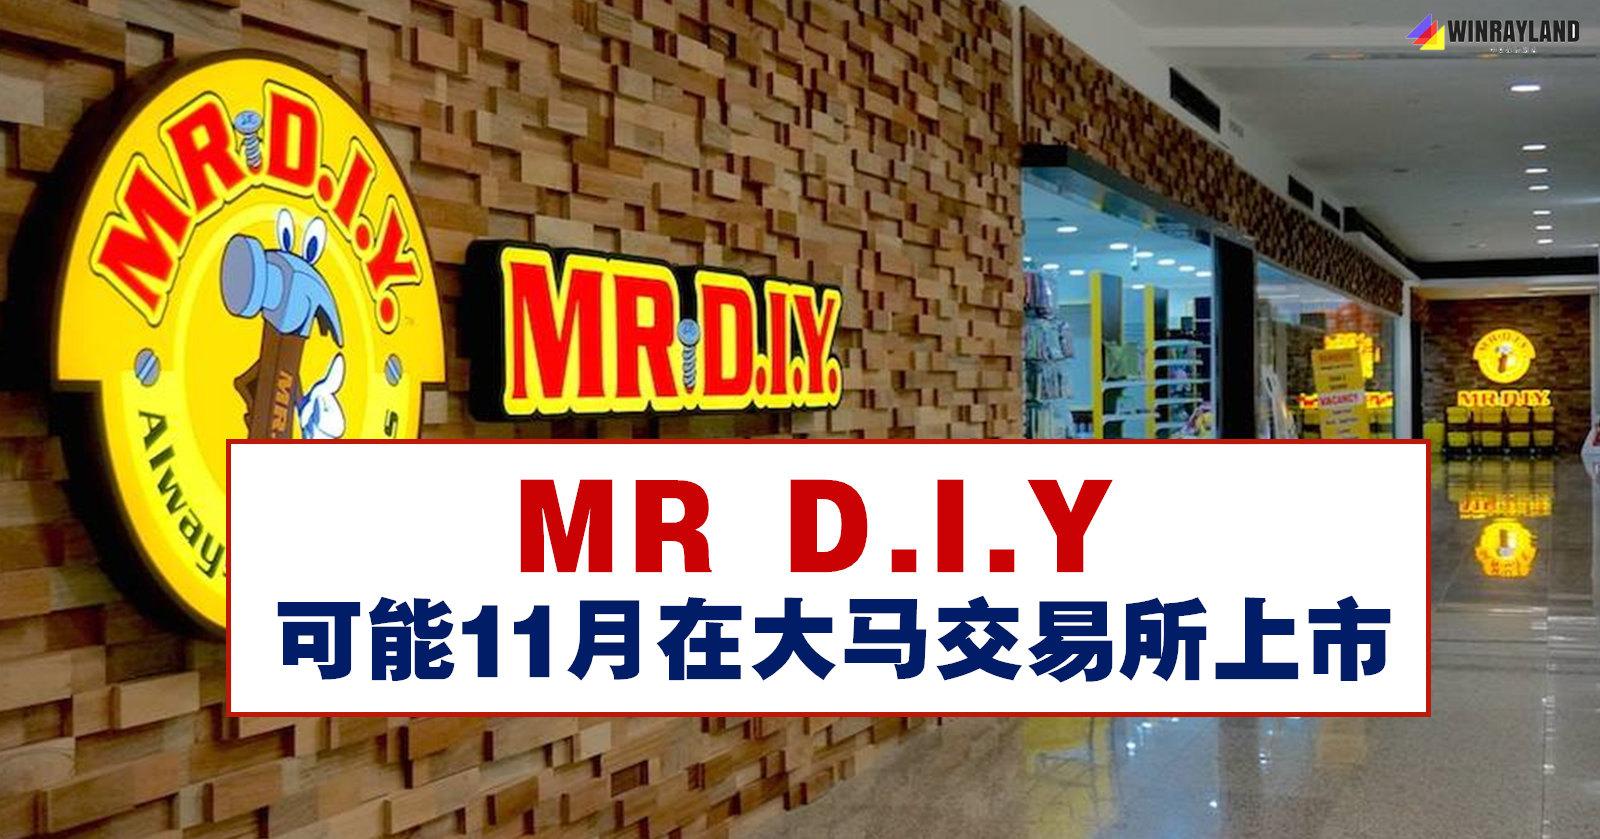 MR DIY计划11月在大马交易所上市